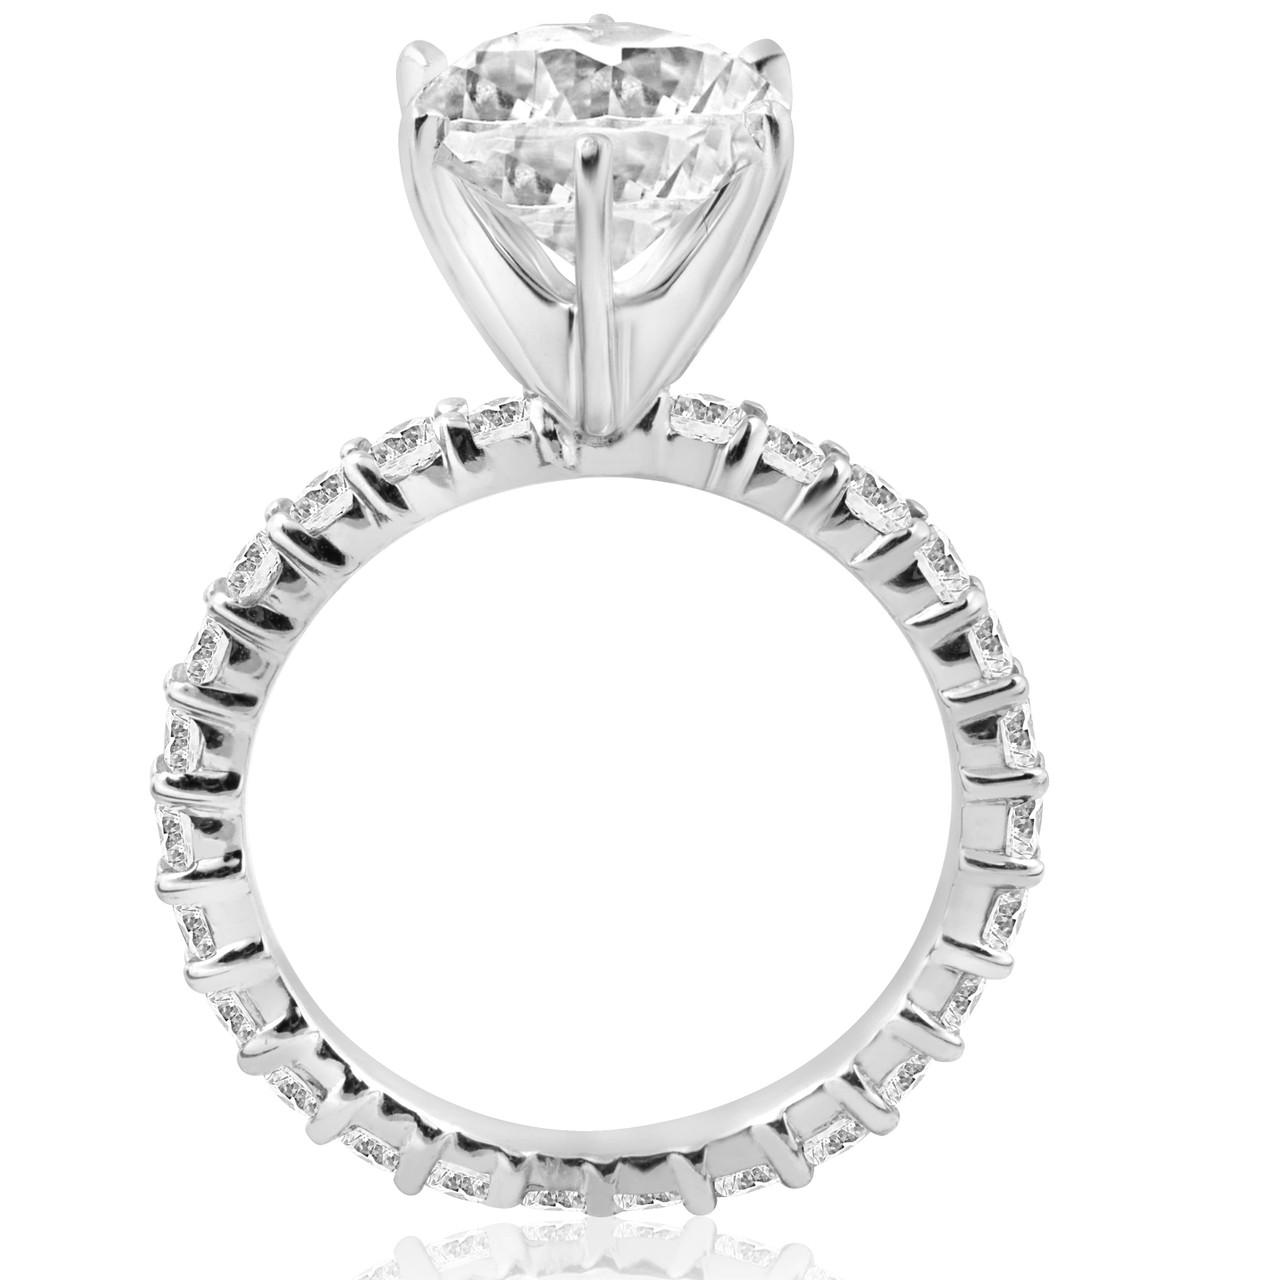 5 carat Enhanced Diamond Engagement Eternity Ring 14K White Gold Round Cut 2598933d74